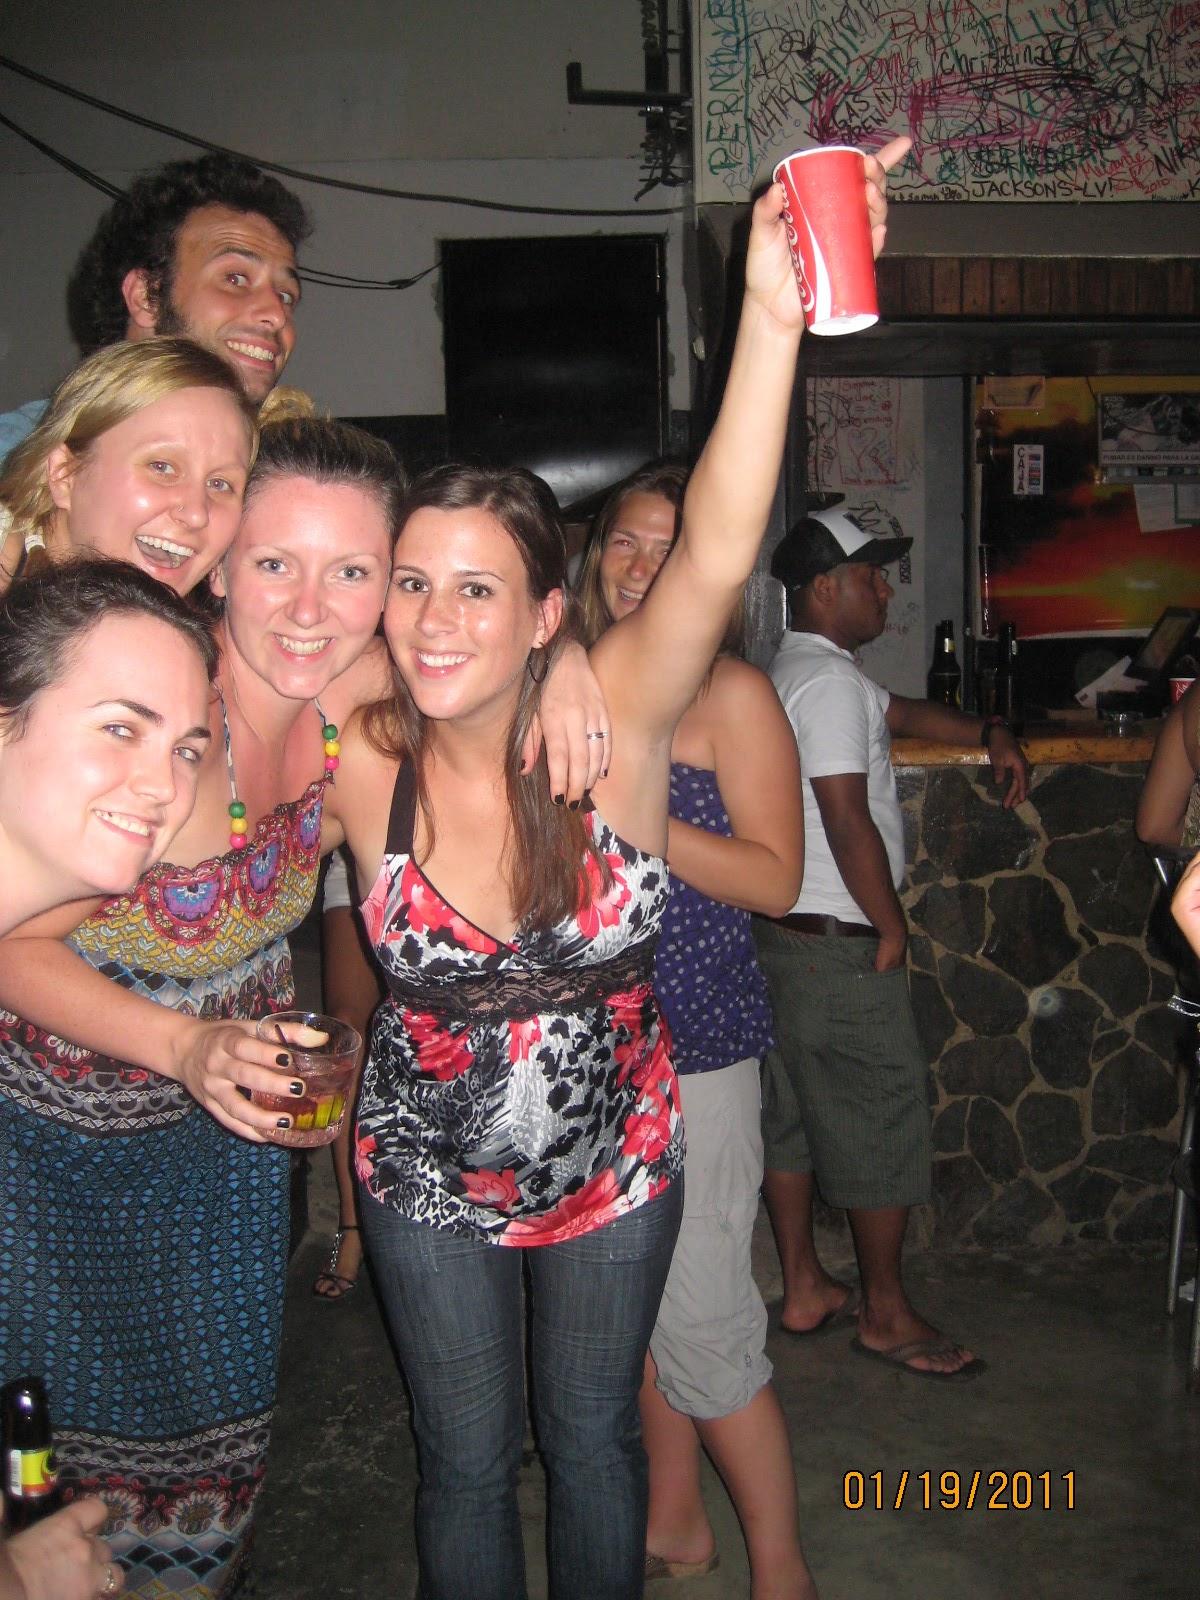 TRAVELING WITH KK: Liberia, Costa Rica - Day 2 - GIRLS